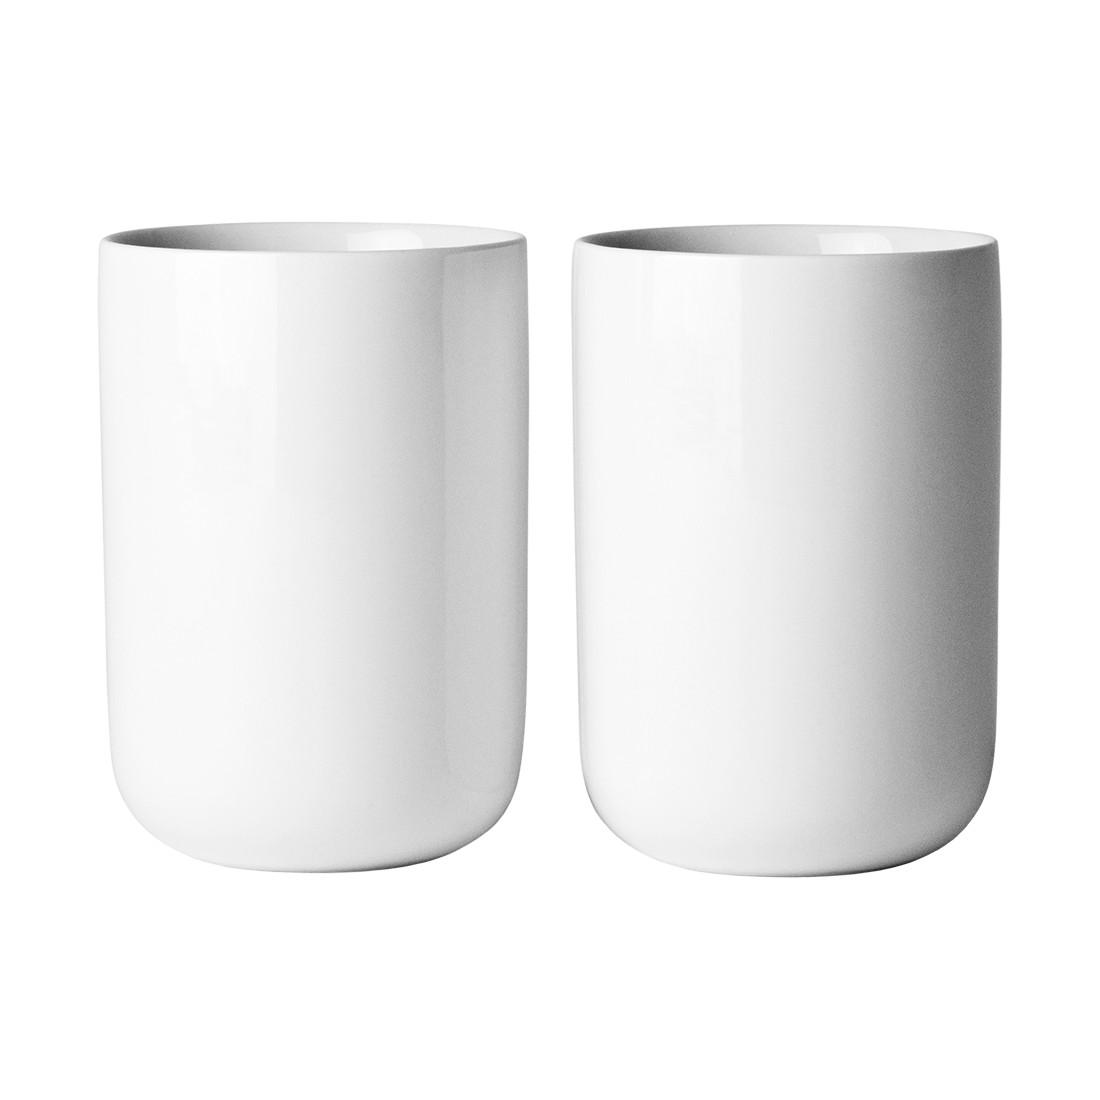 thermobecher new norm wei 2er set porzellan wei 0 275 liter 12 cm menu g nstig online kaufen. Black Bedroom Furniture Sets. Home Design Ideas